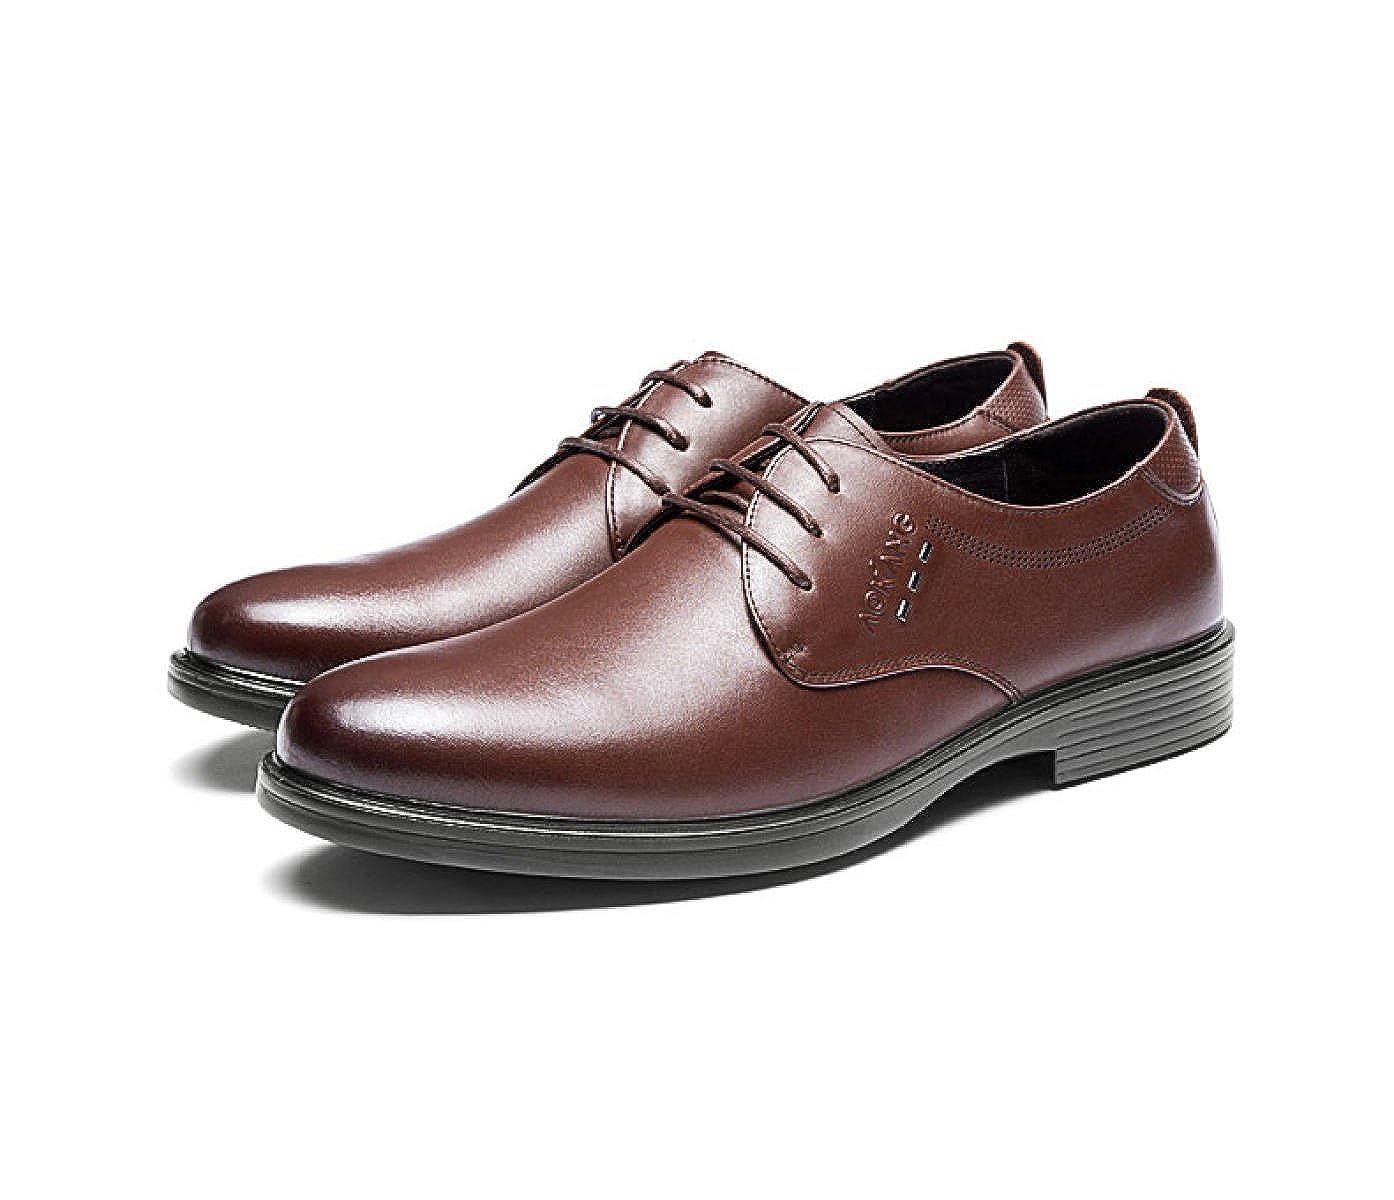 Zapatos Zapatos Zapatos De Cuero Zapatos De Hombre Juventud Business Dress Hombre Fashion Zapatos 4efa7c